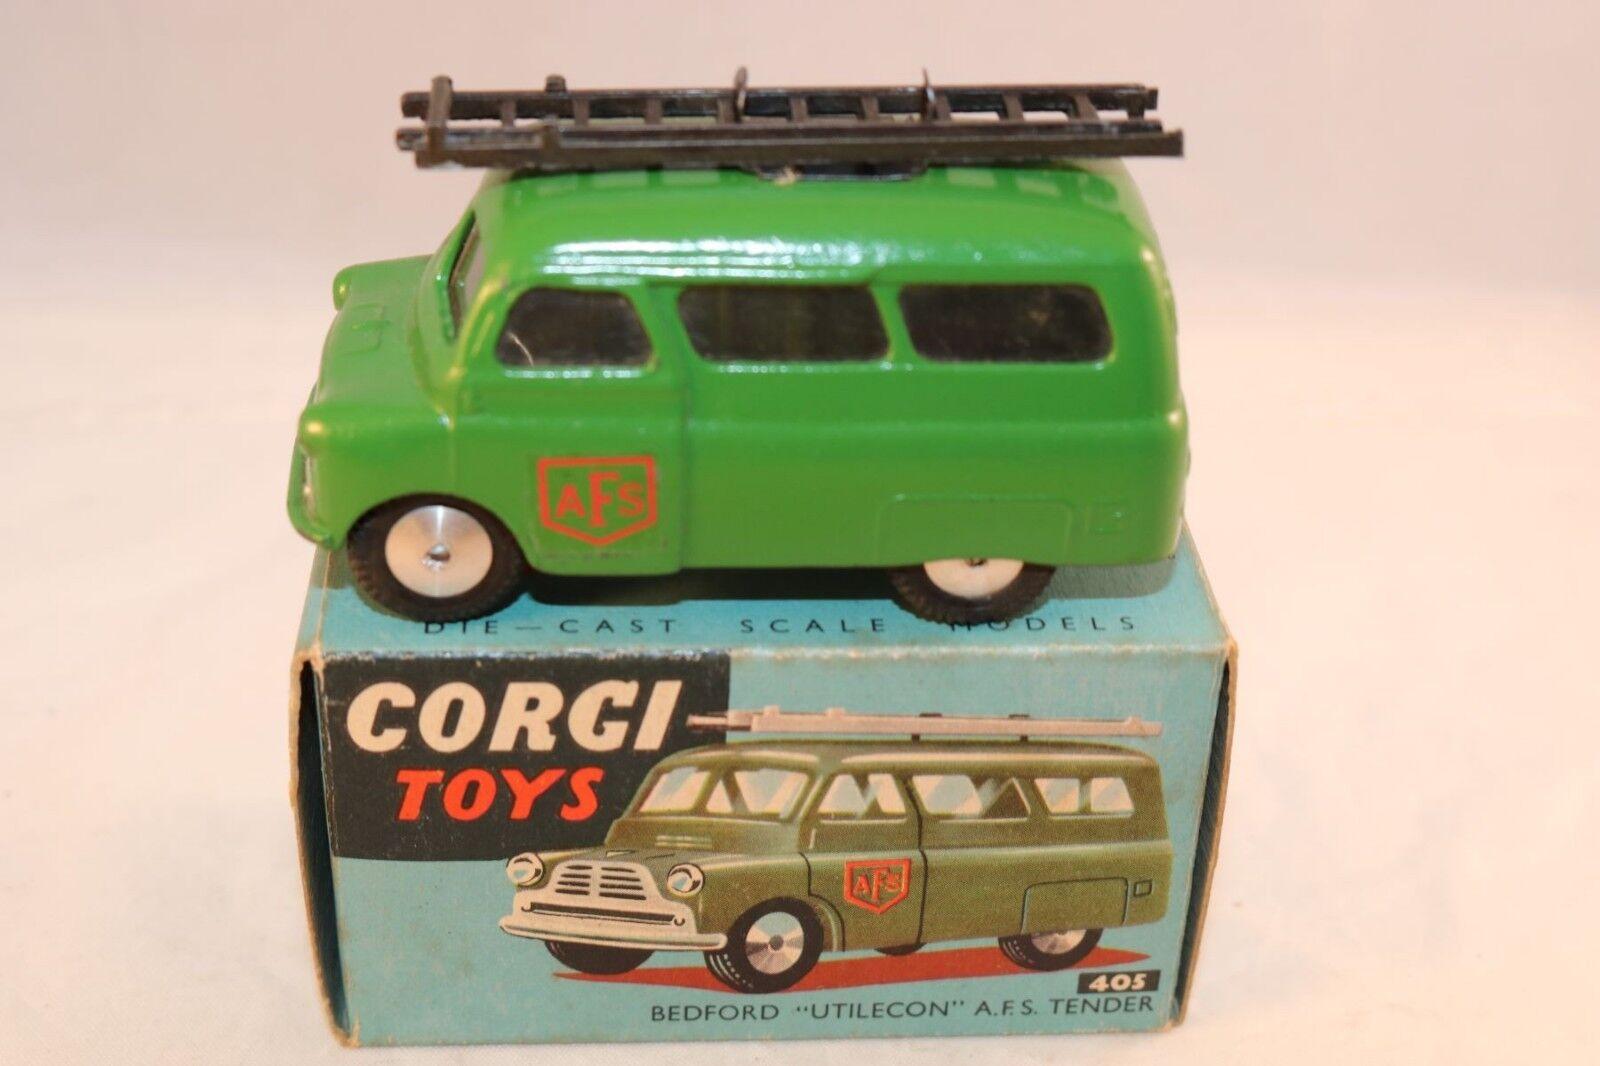 Corgi Toys 405 Bedford  Utilecon A.F.S. Tender very near mint in box